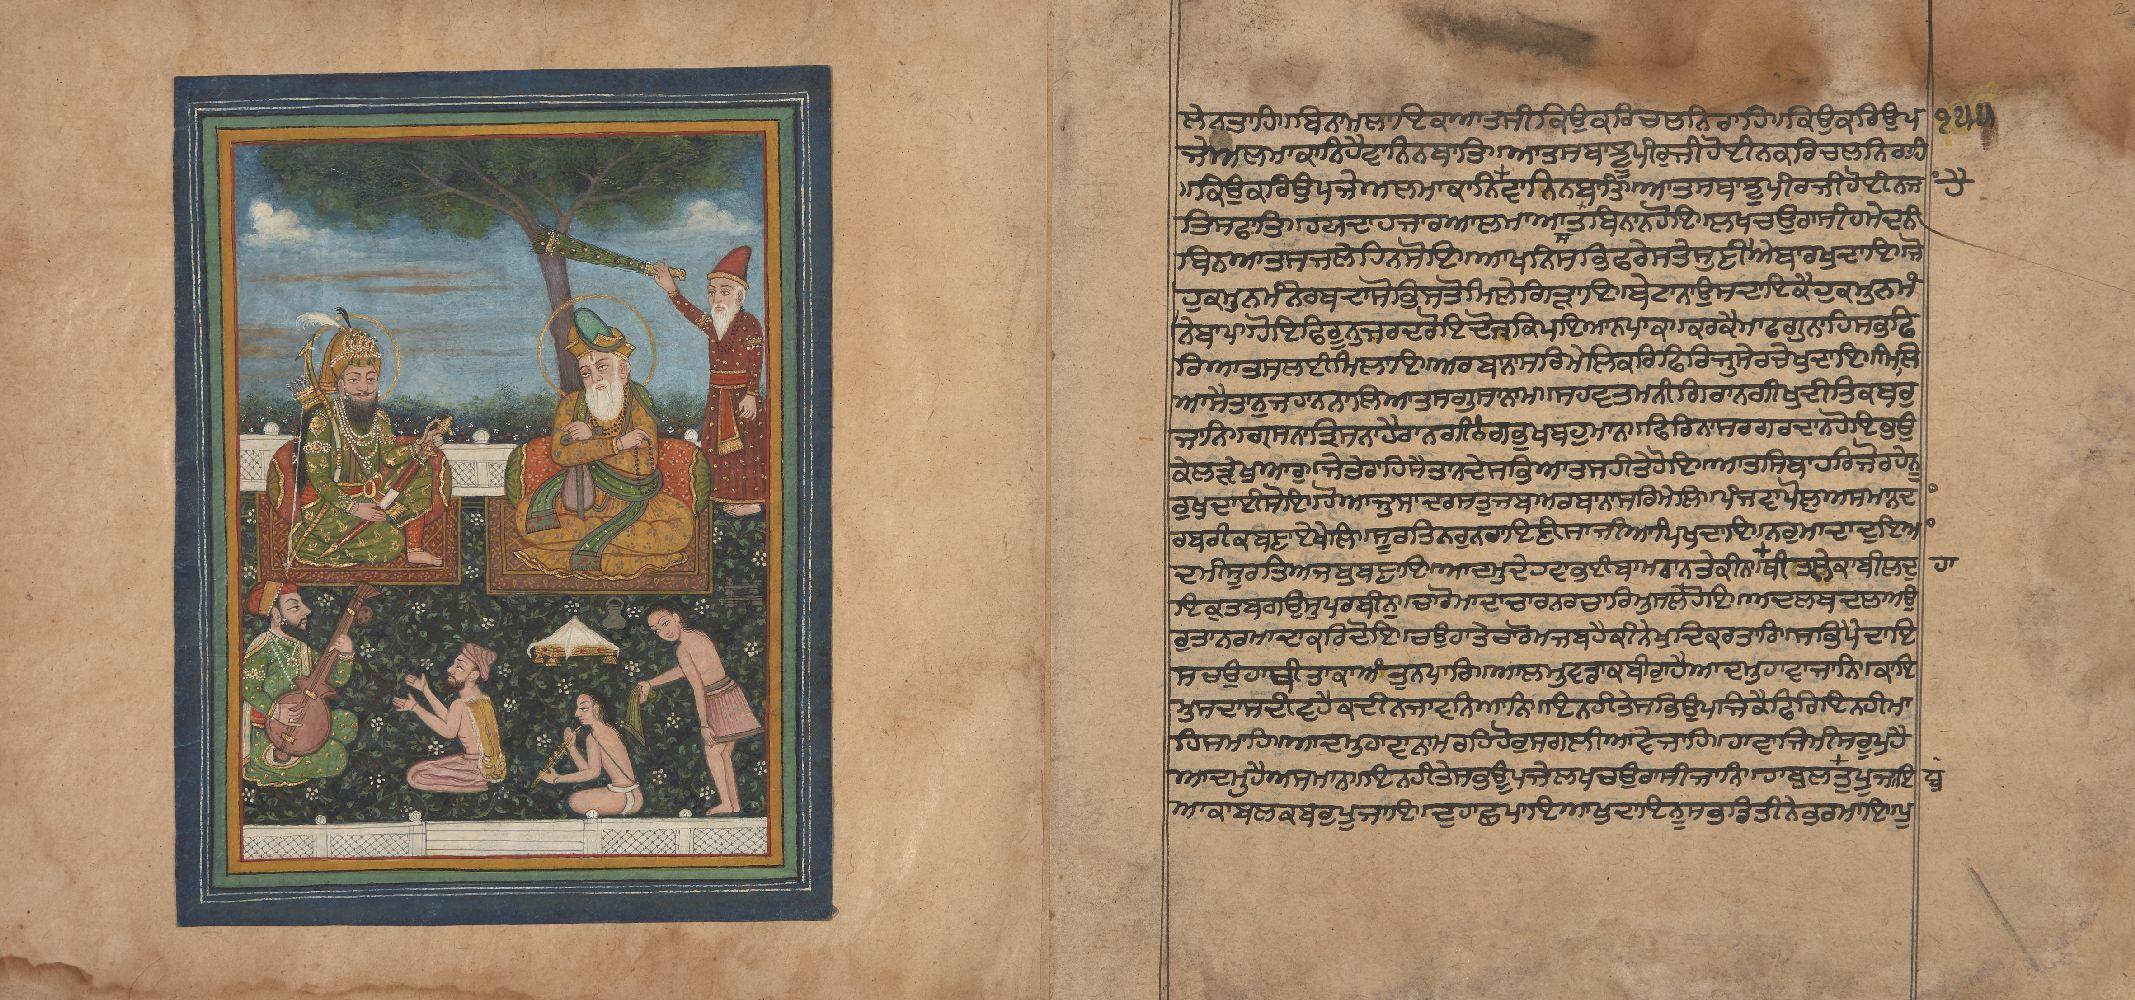 A large folio from a dispersed Janamsakhi manuscript depicting a fictitious meeting between Guru